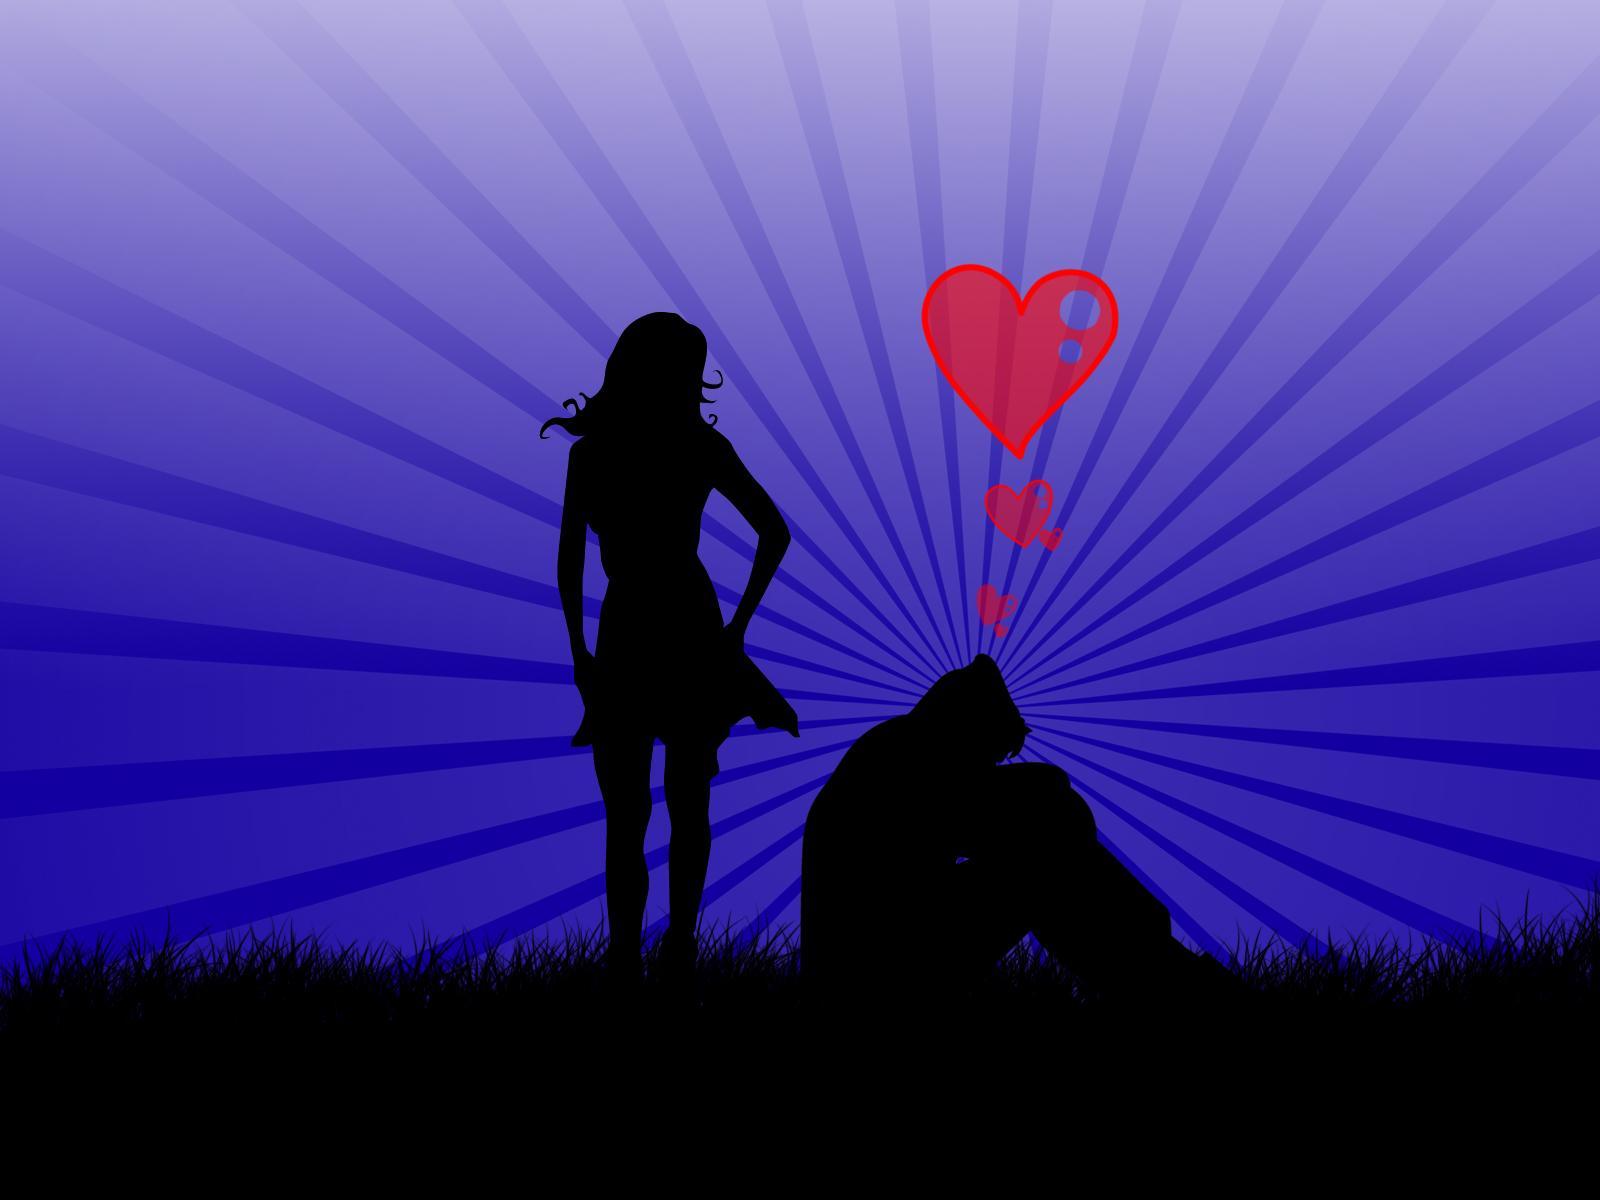 http://1.bp.blogspot.com/-EIcfn3r3dcs/T8DPk__28pI/AAAAAAAAAVA/Bo0aCf48GXY/s1600/Feel+My+Love+Wallpaper.jpg